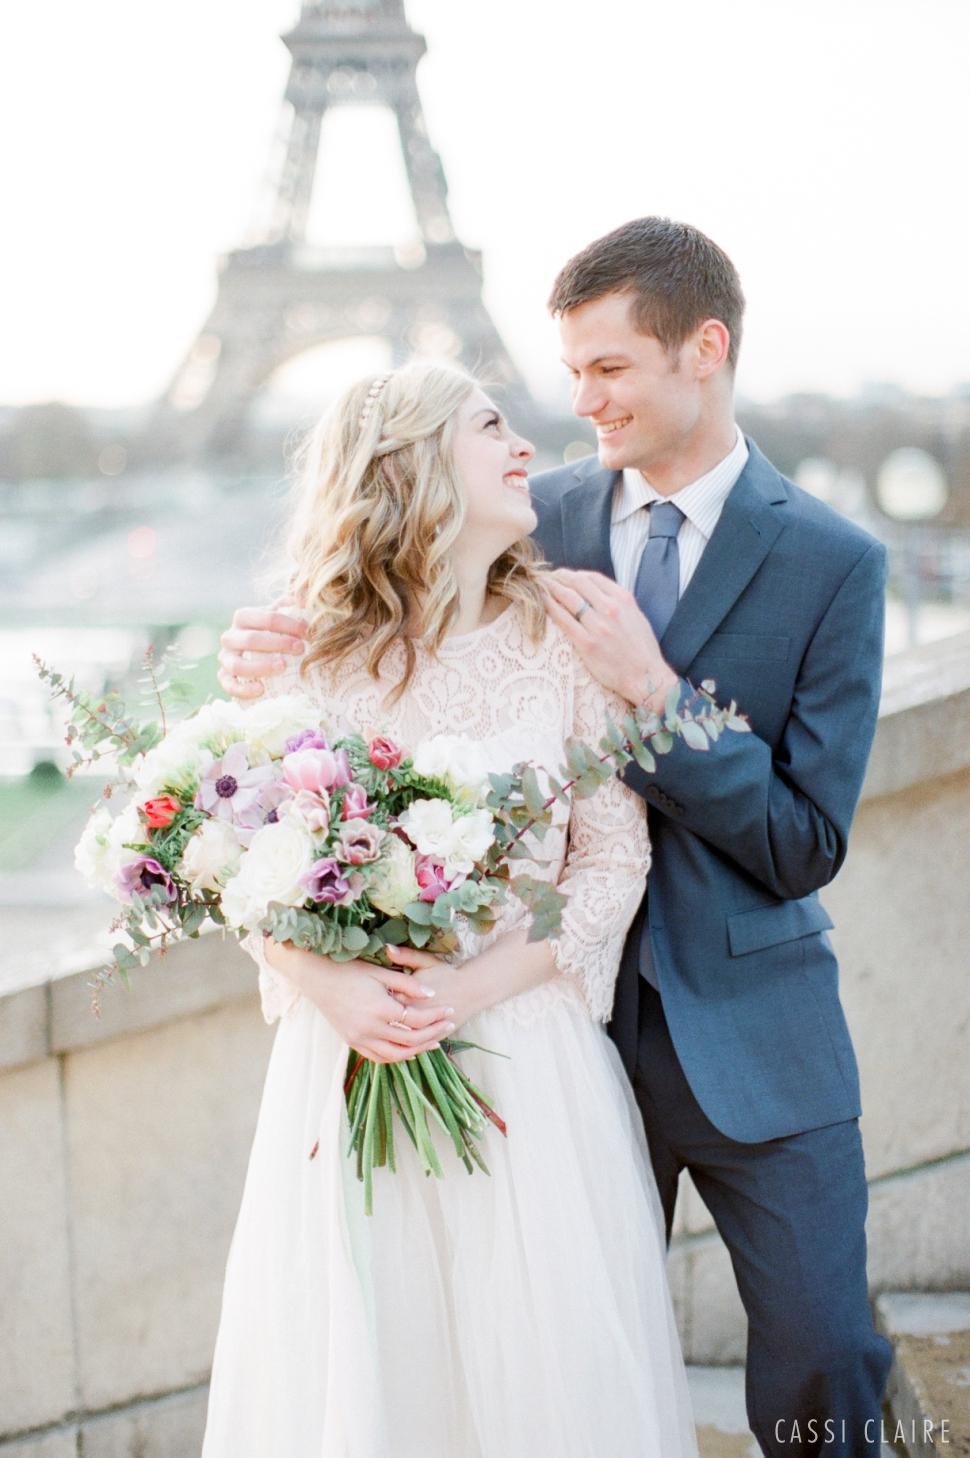 Paris-France-Wedding_CassiClaire_18.jpg